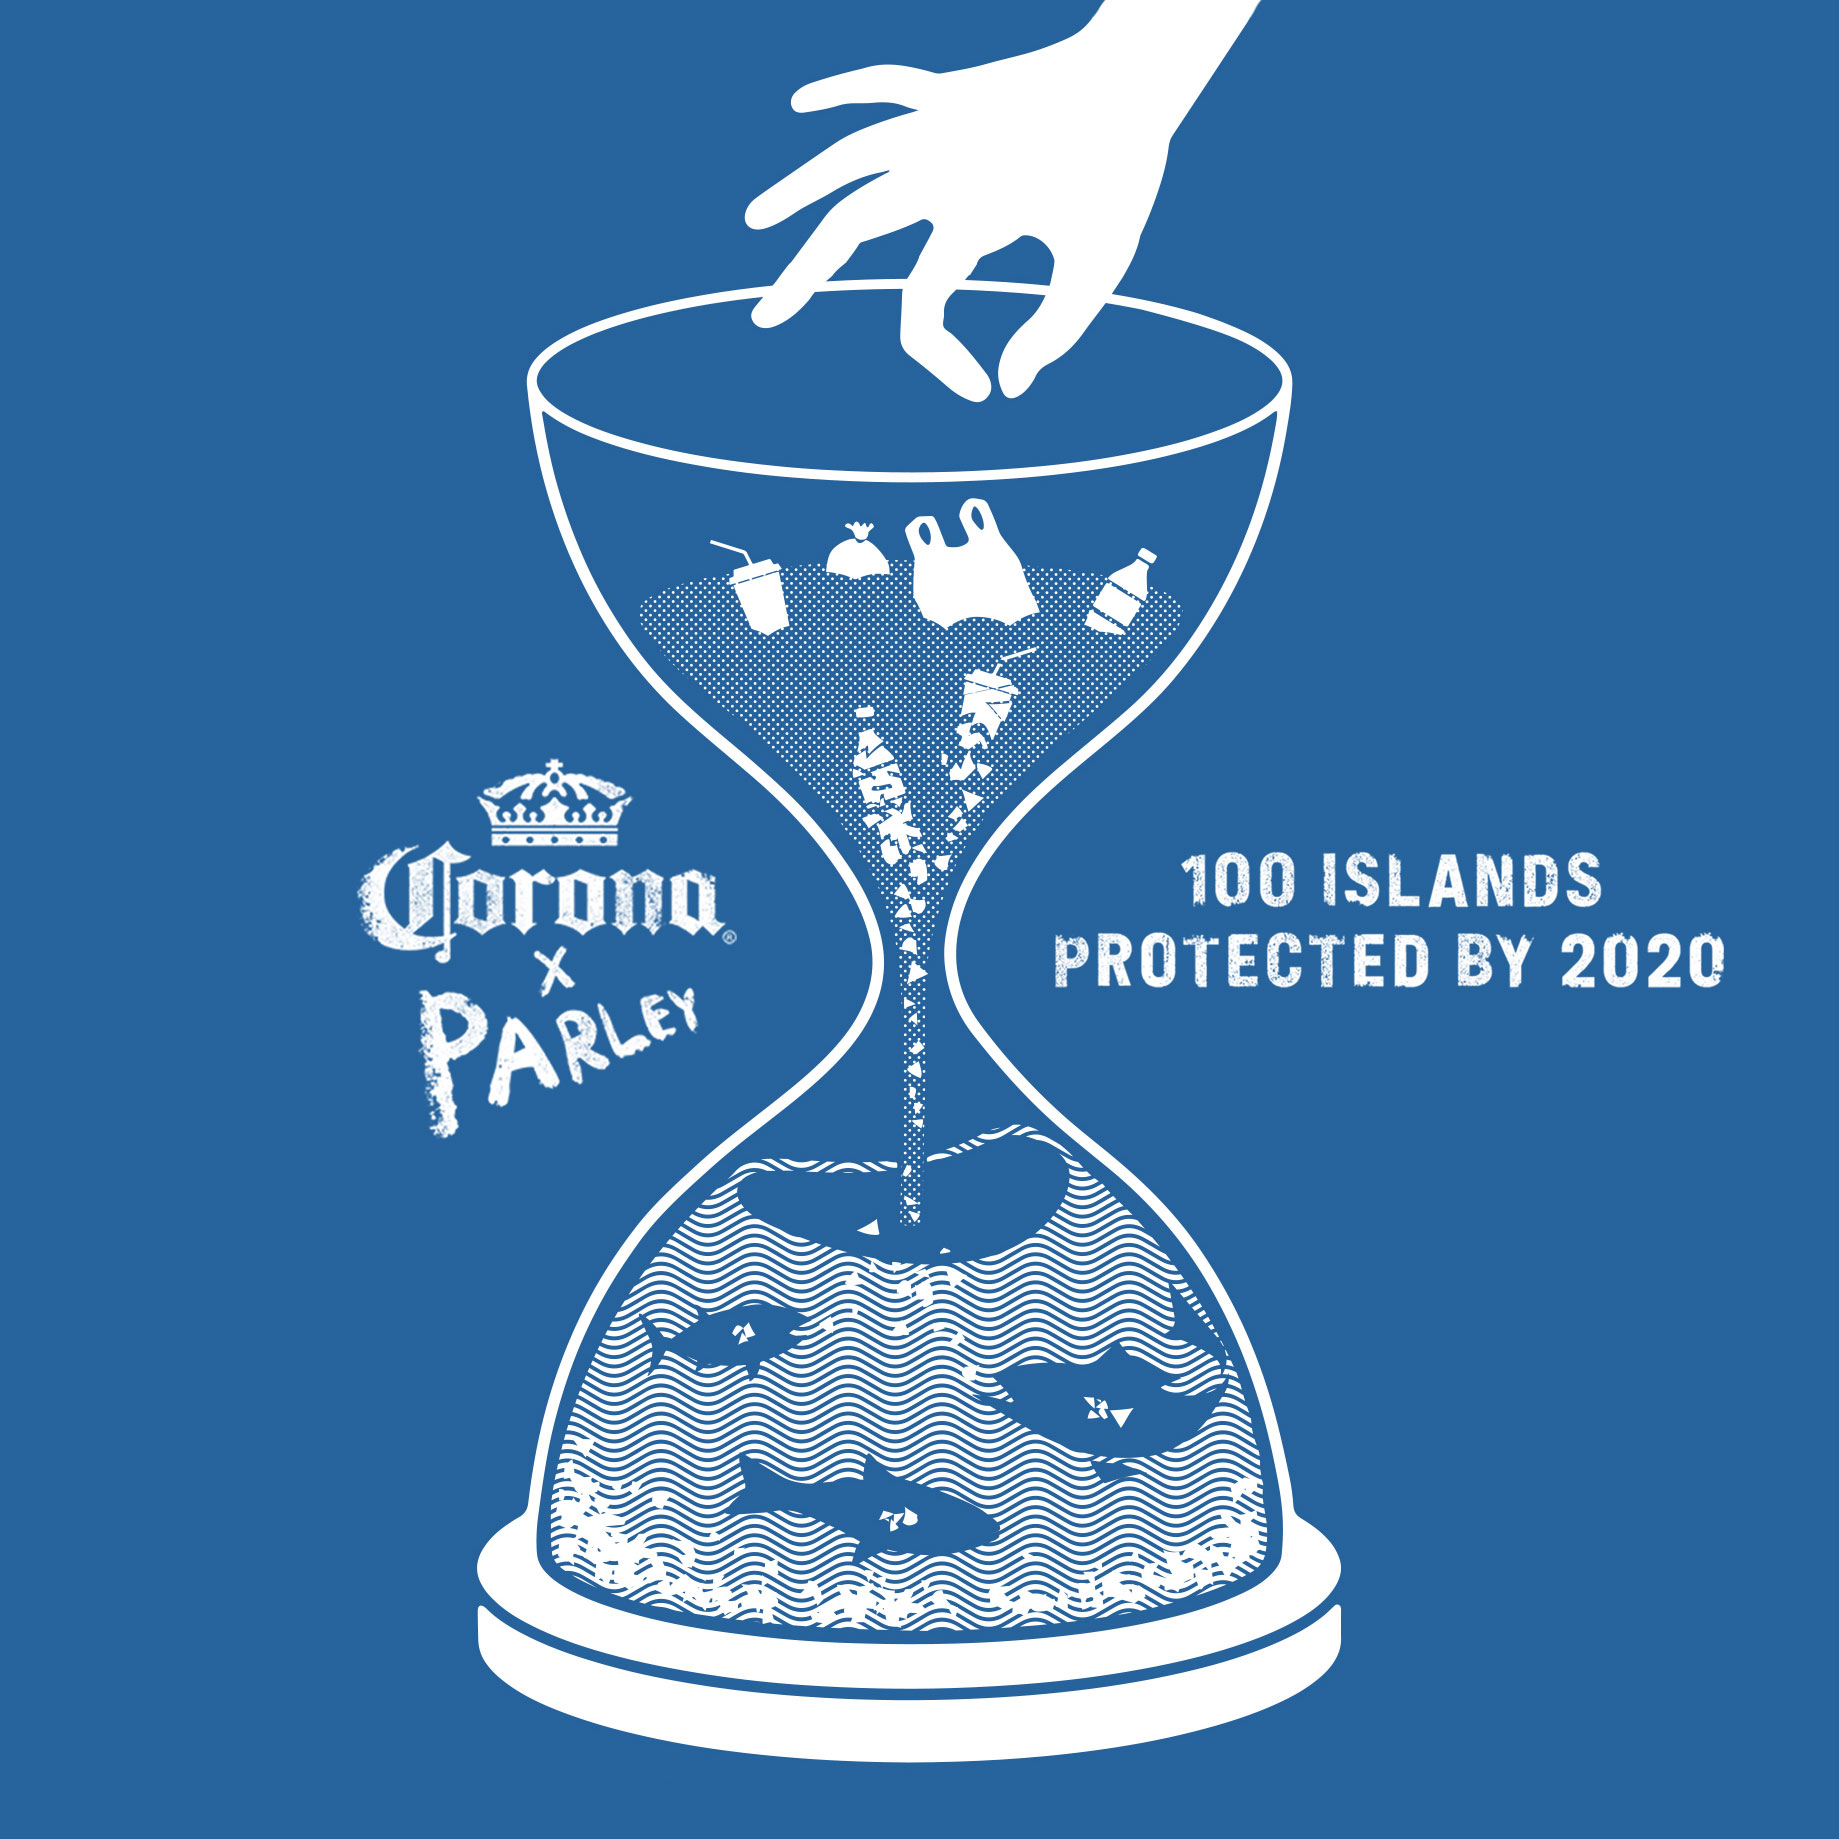 Corona-X-Parley-illustration-Ronny-Bergfeldt-blue2.jpg